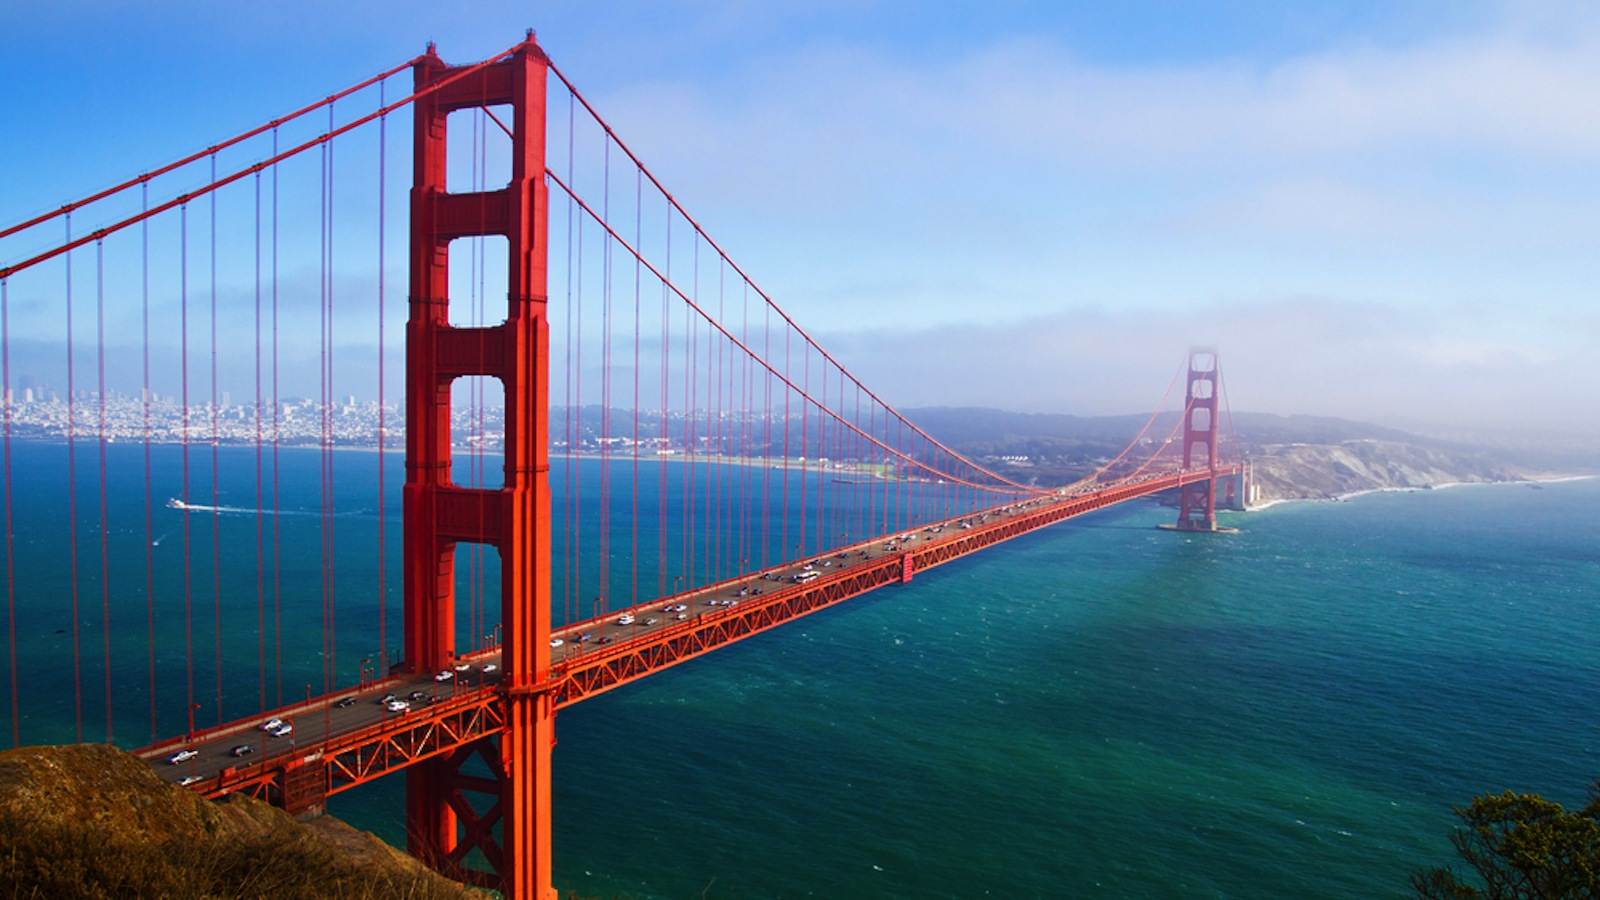 San Francisco trip planner